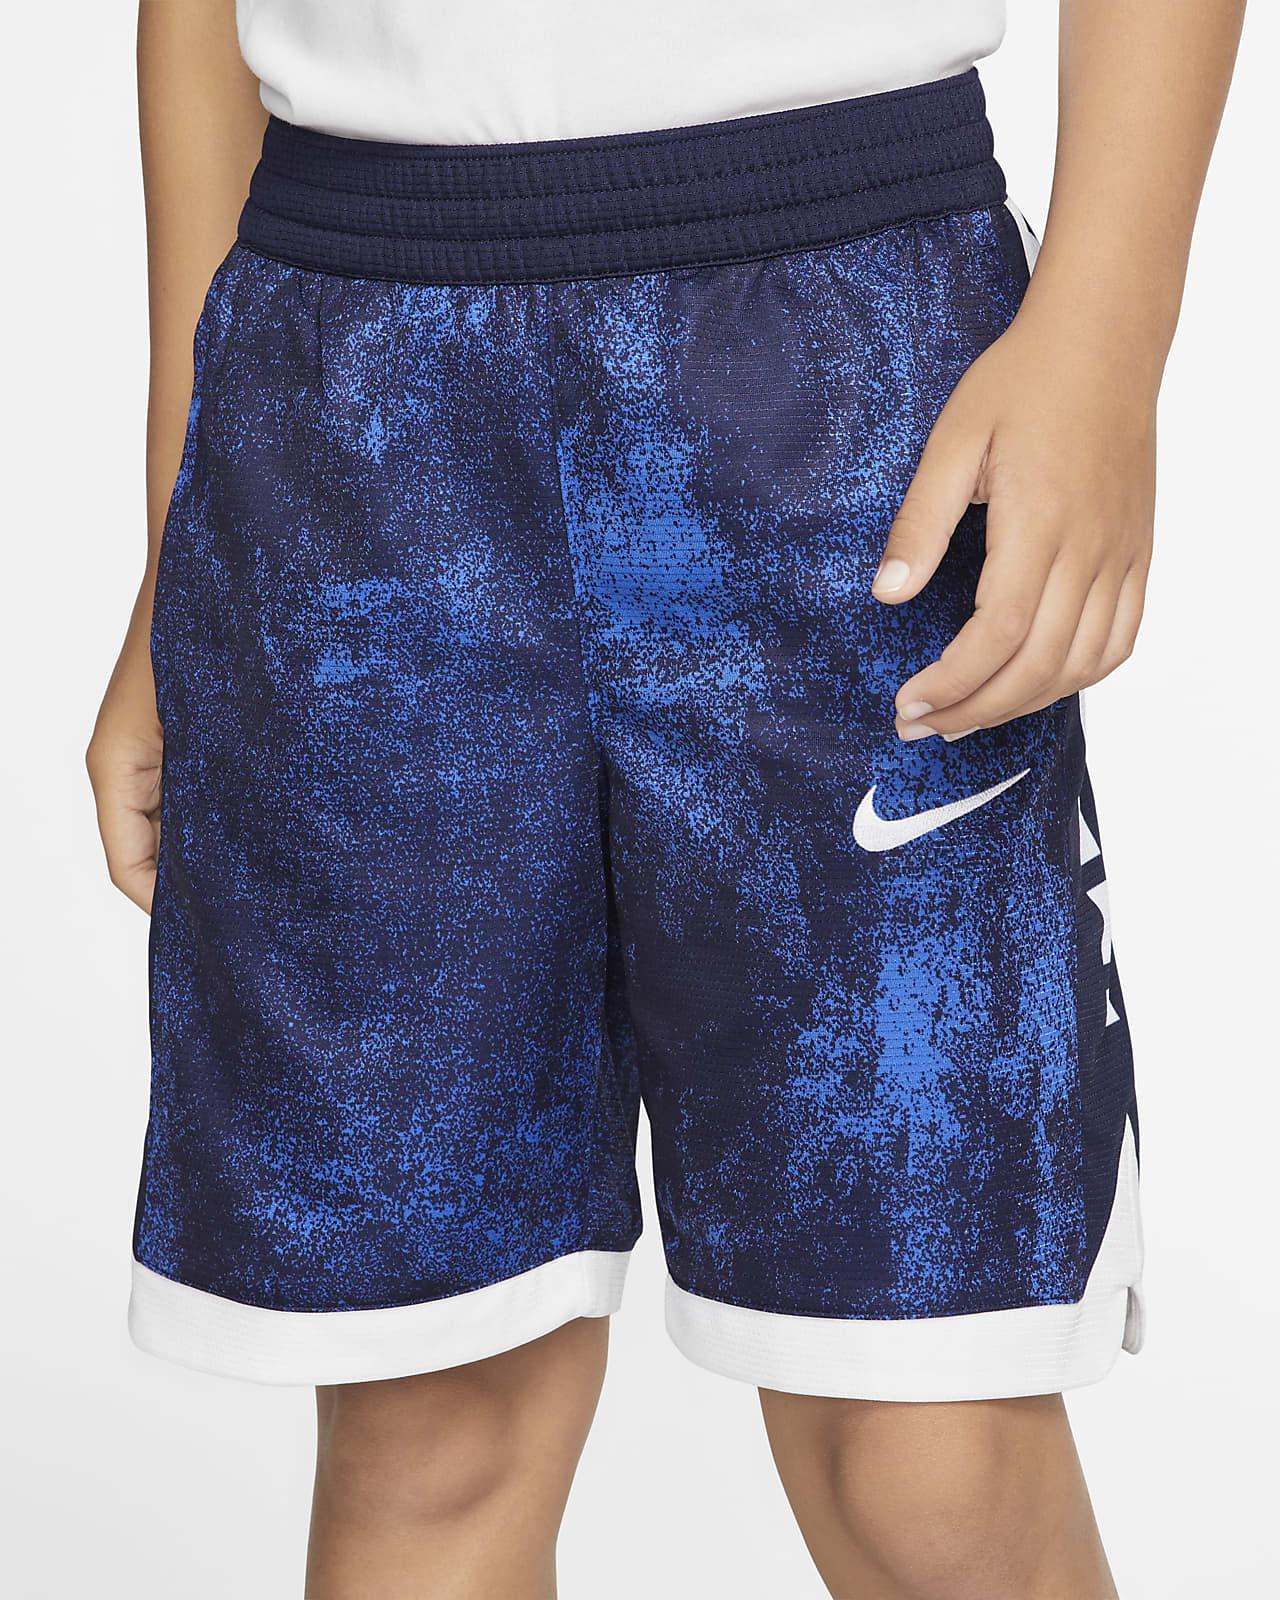 Nike Dri-FIT Elite Boys' Printed Basketball Shorts